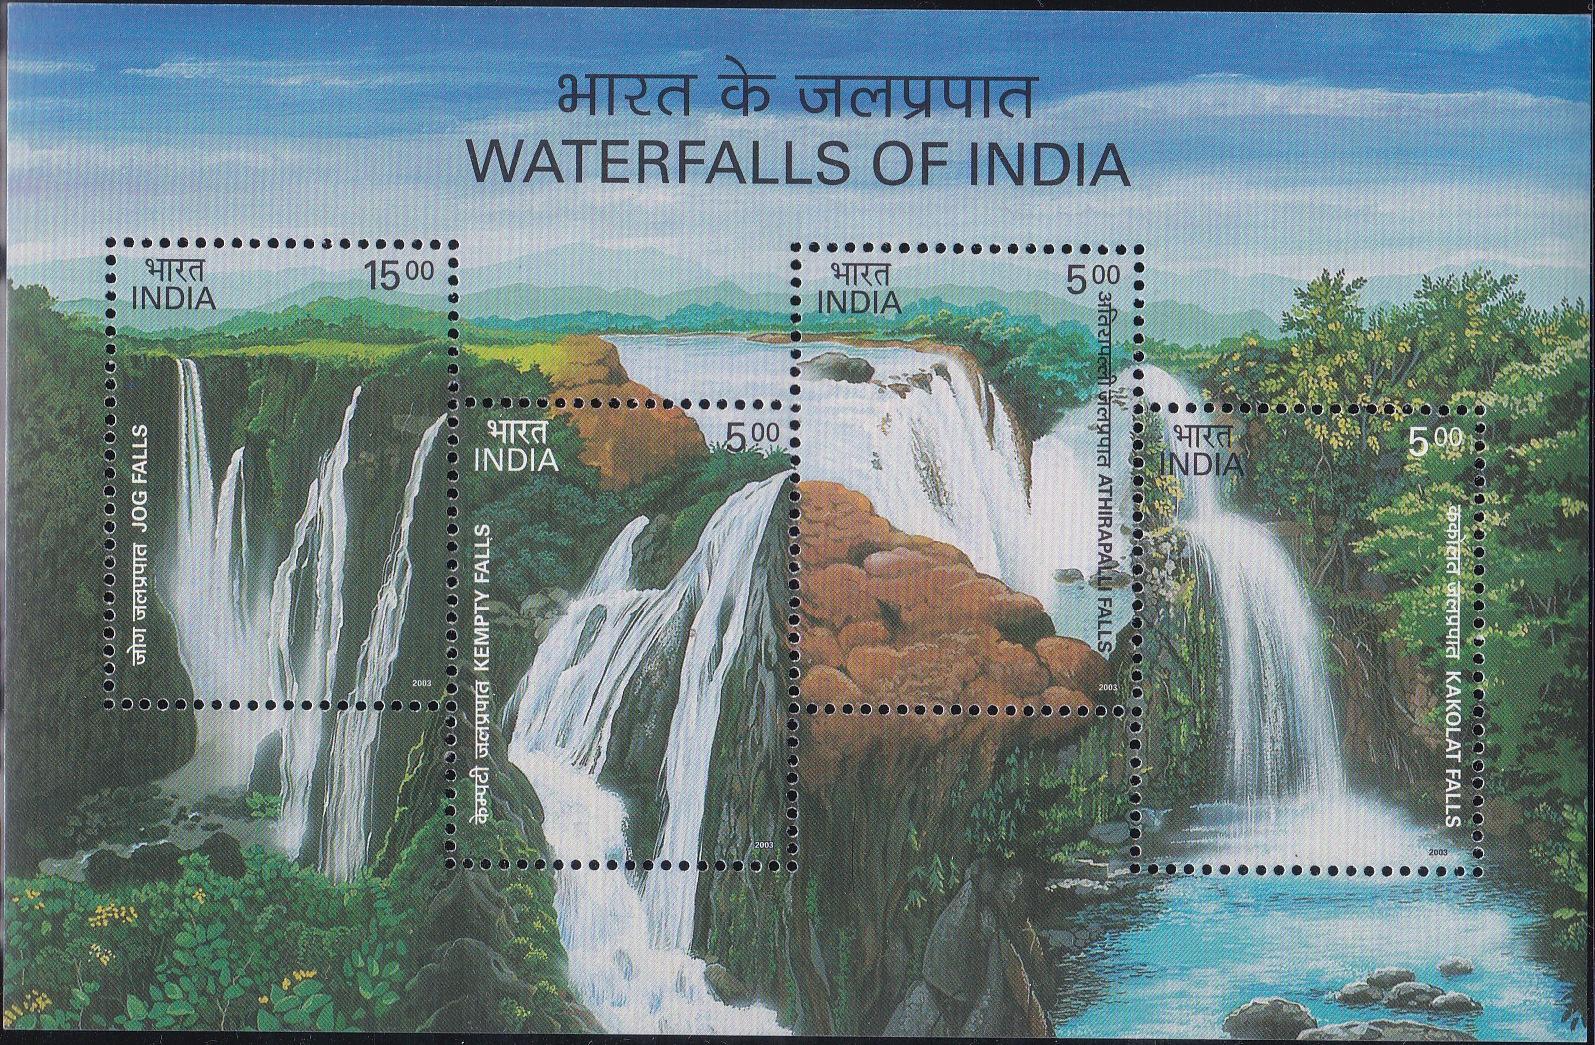 Athirappilly,Jog,Kempty &Kakolat falls